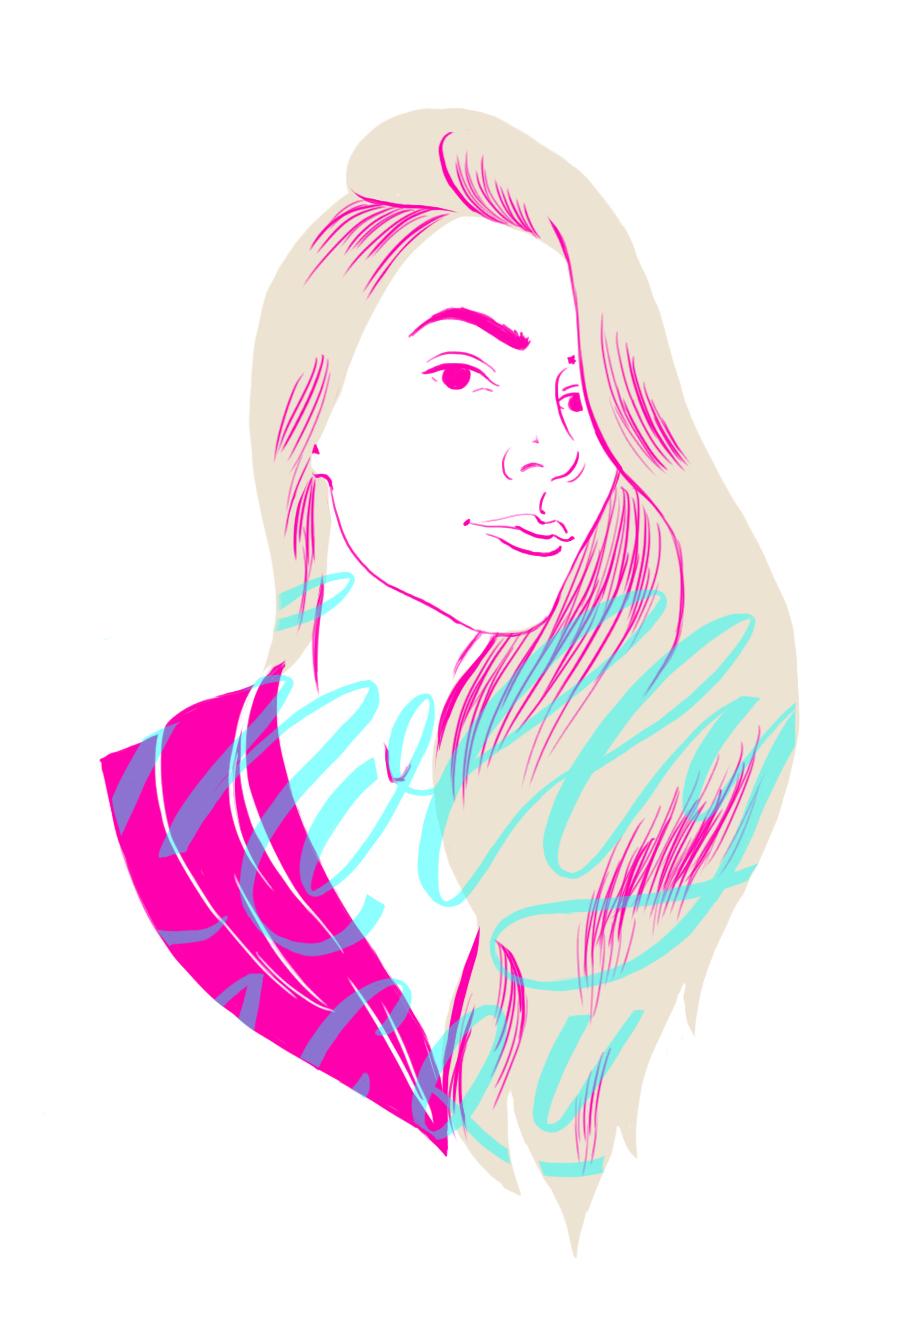 @mollyjacques portrait #illustration